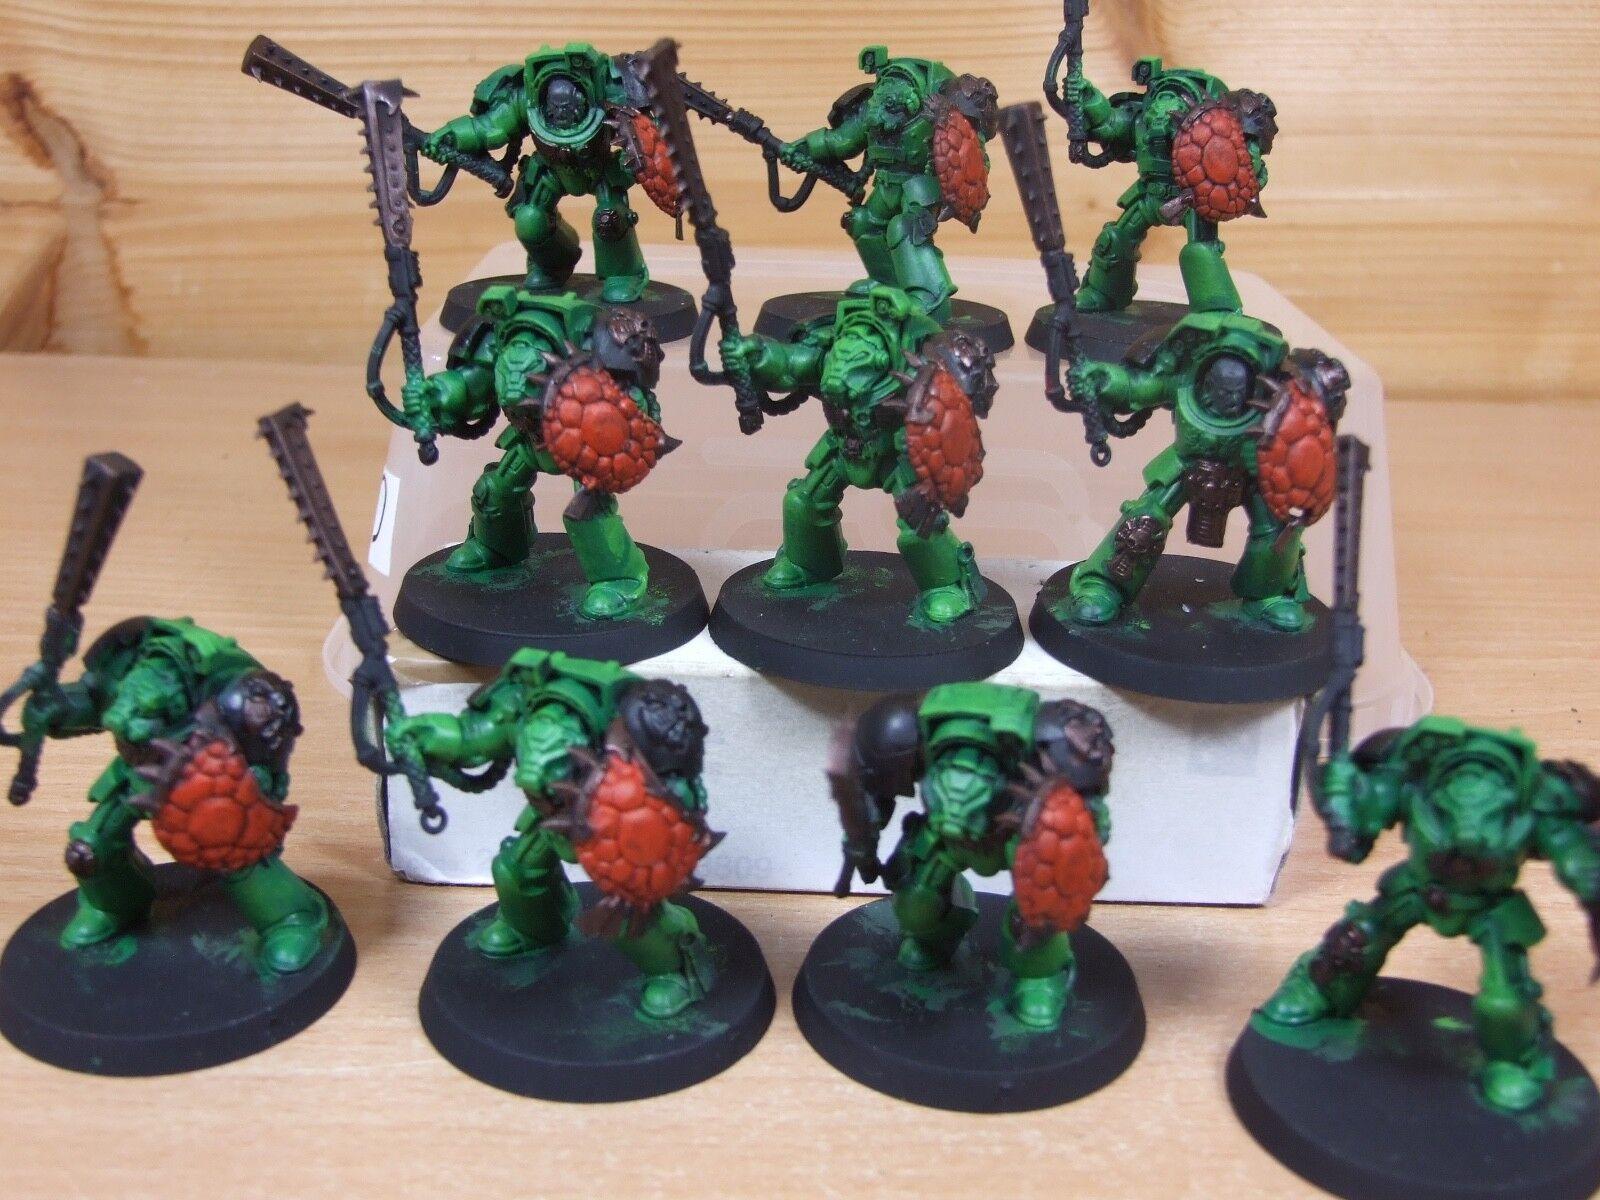 10 convertis convertis convertis Salamandre Assault Terminators peint (220) 089f61